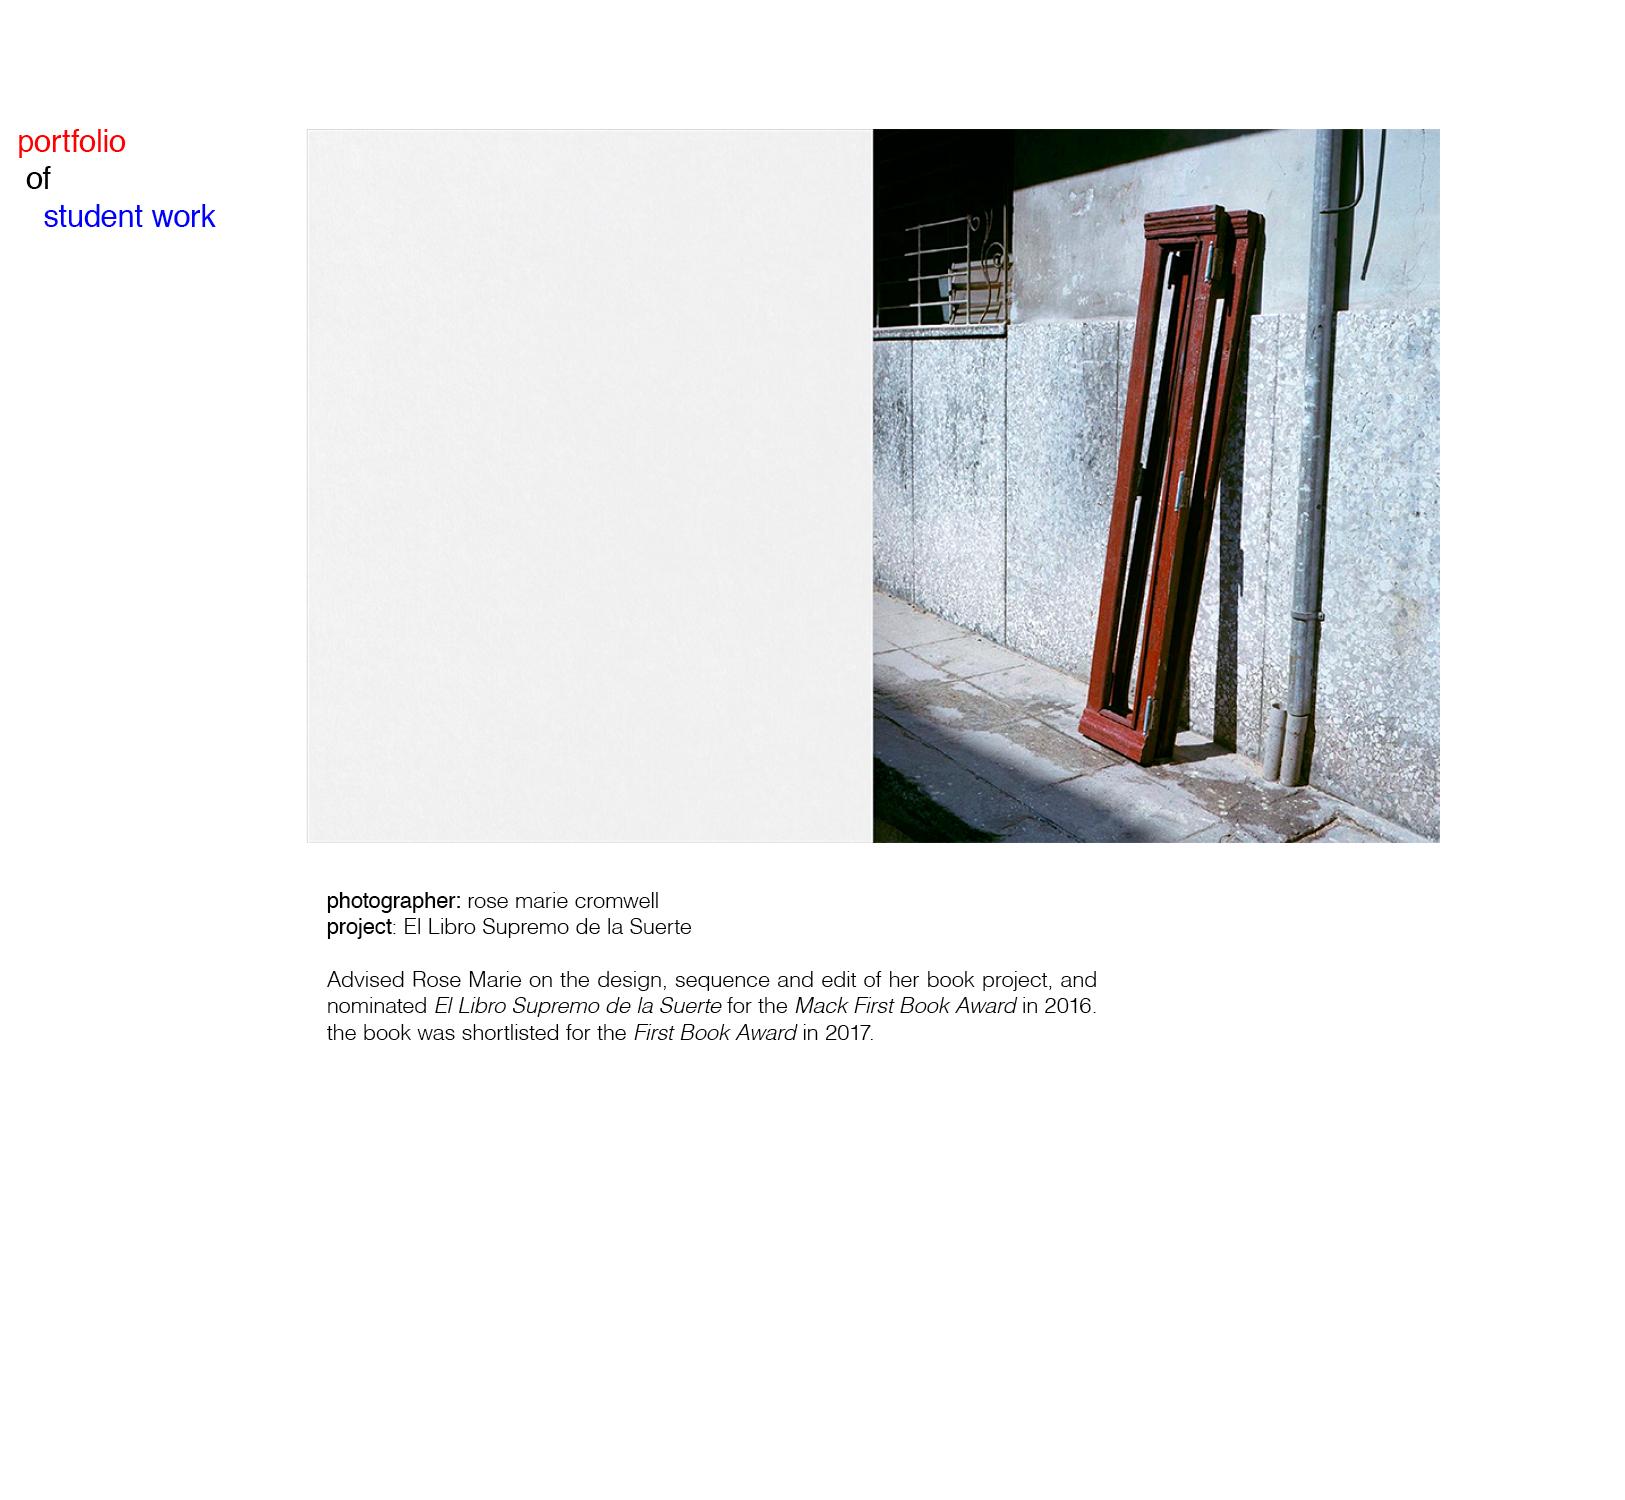 RMC_book_02.jpg